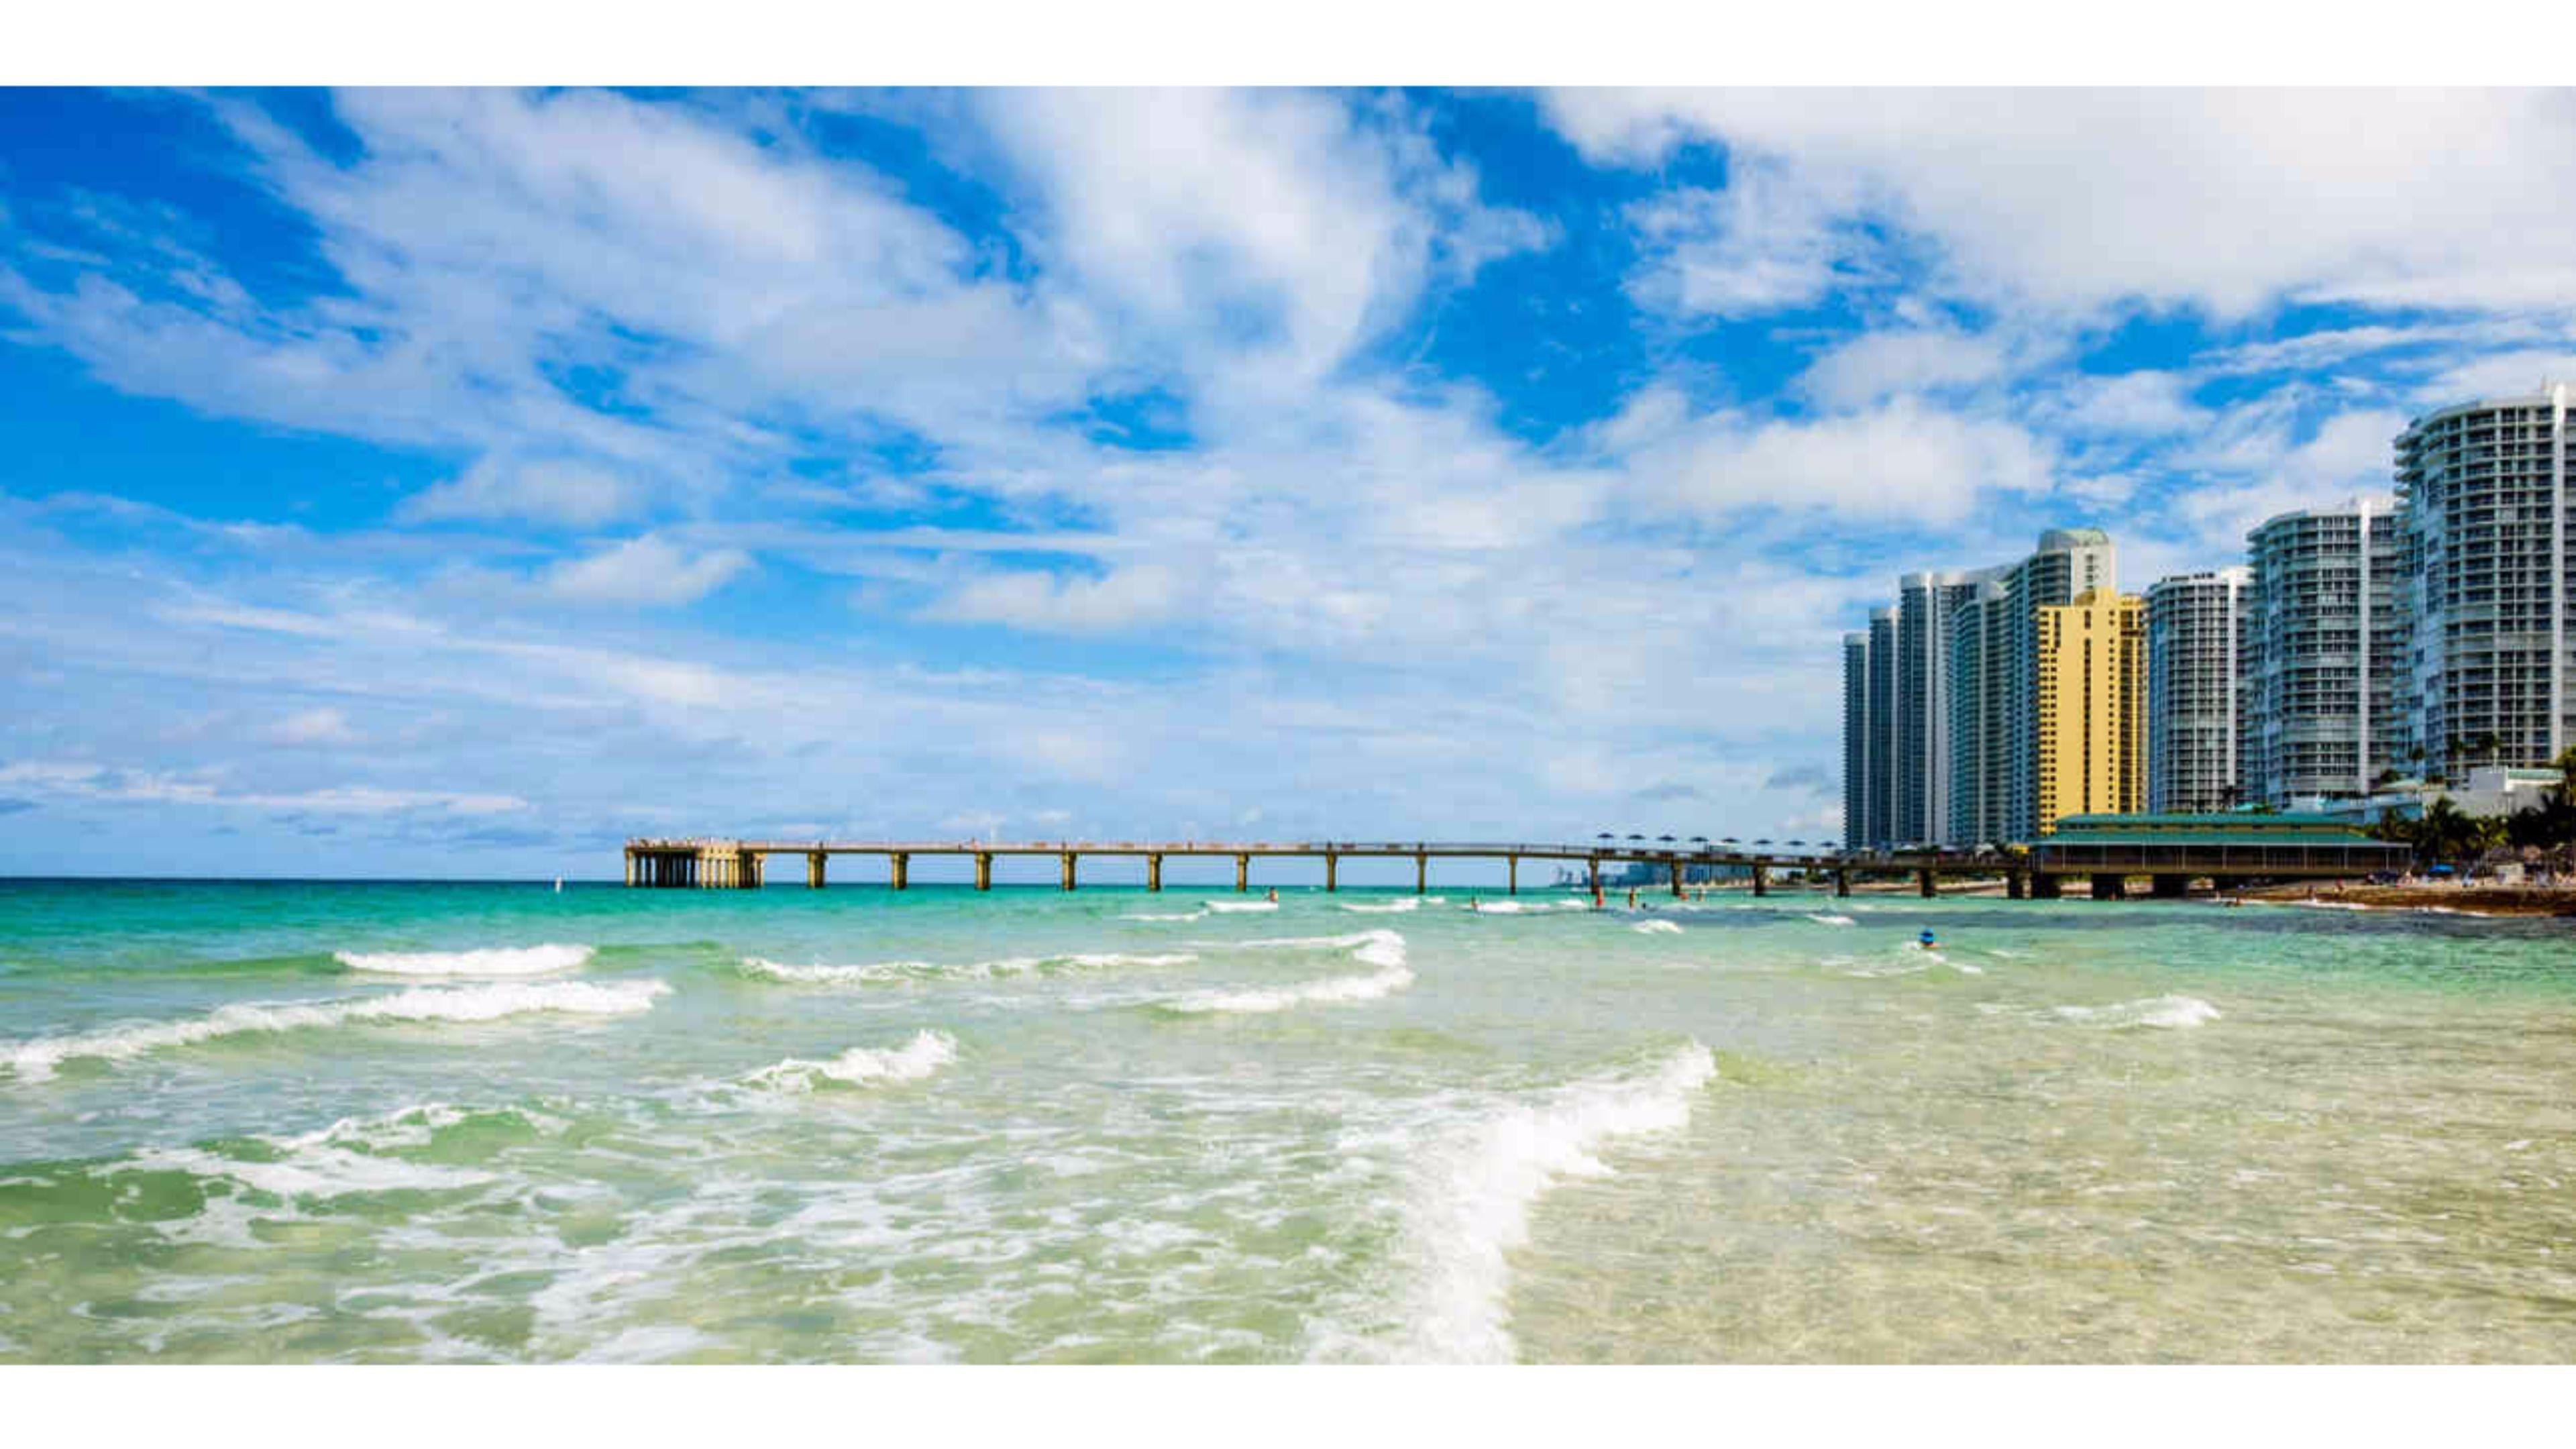 Miami South Beach Wallpaper Wallpapertag